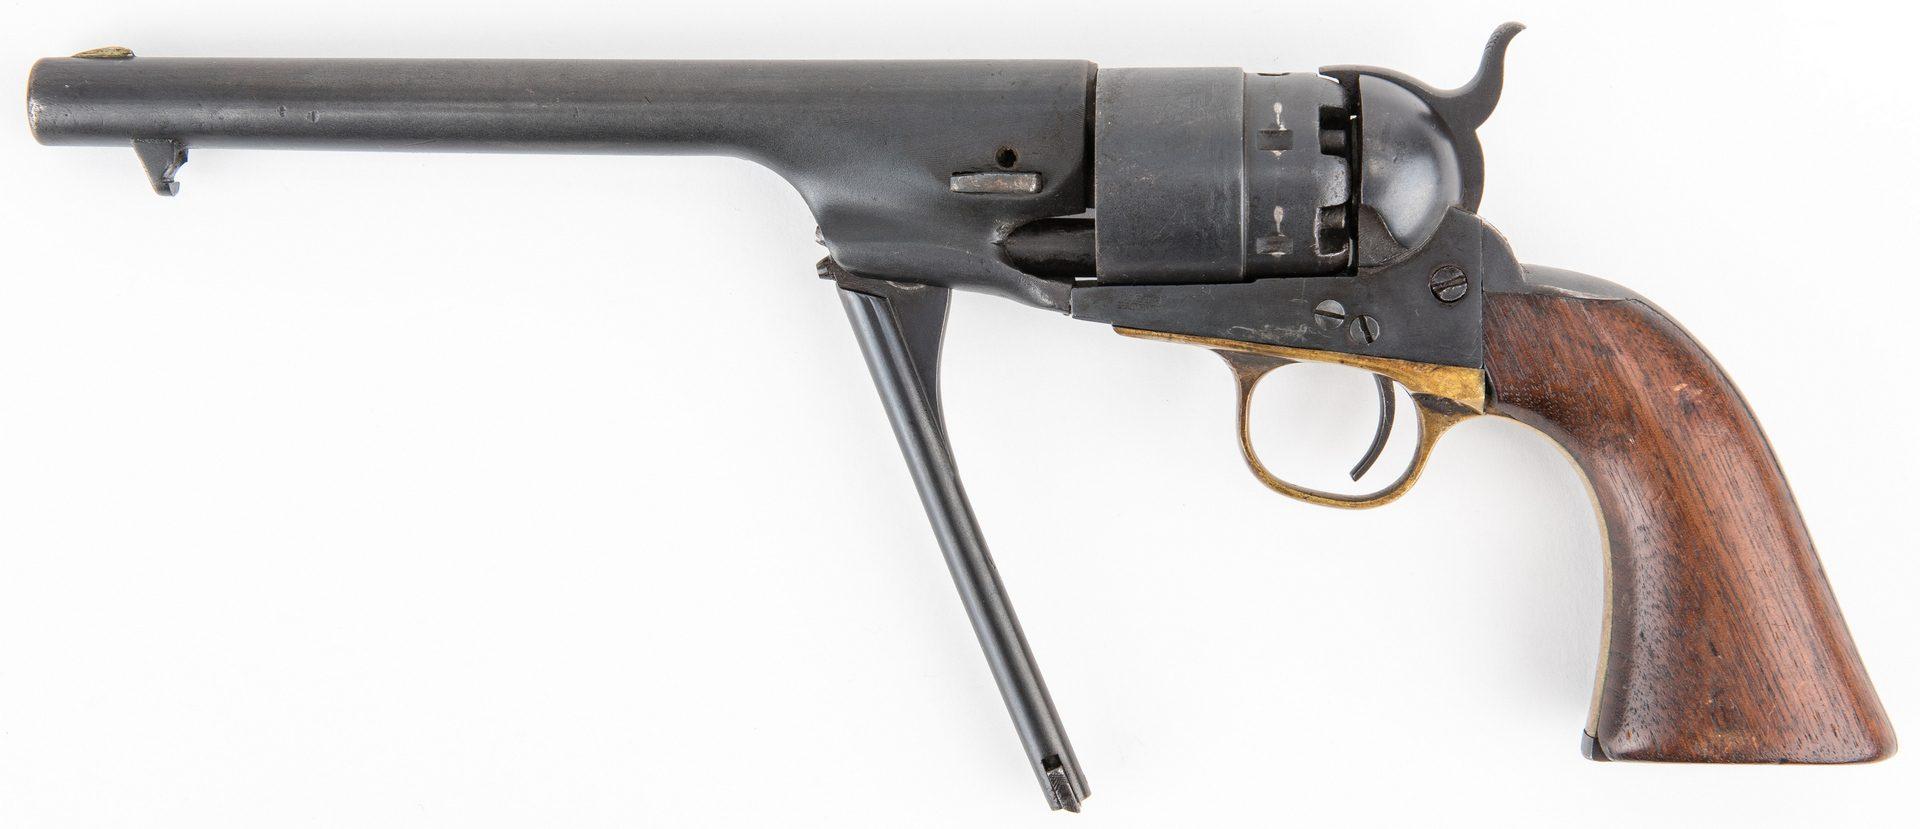 Lot 778: Mismatched Colt Model 1860 Army Revolver, .44 Caliber